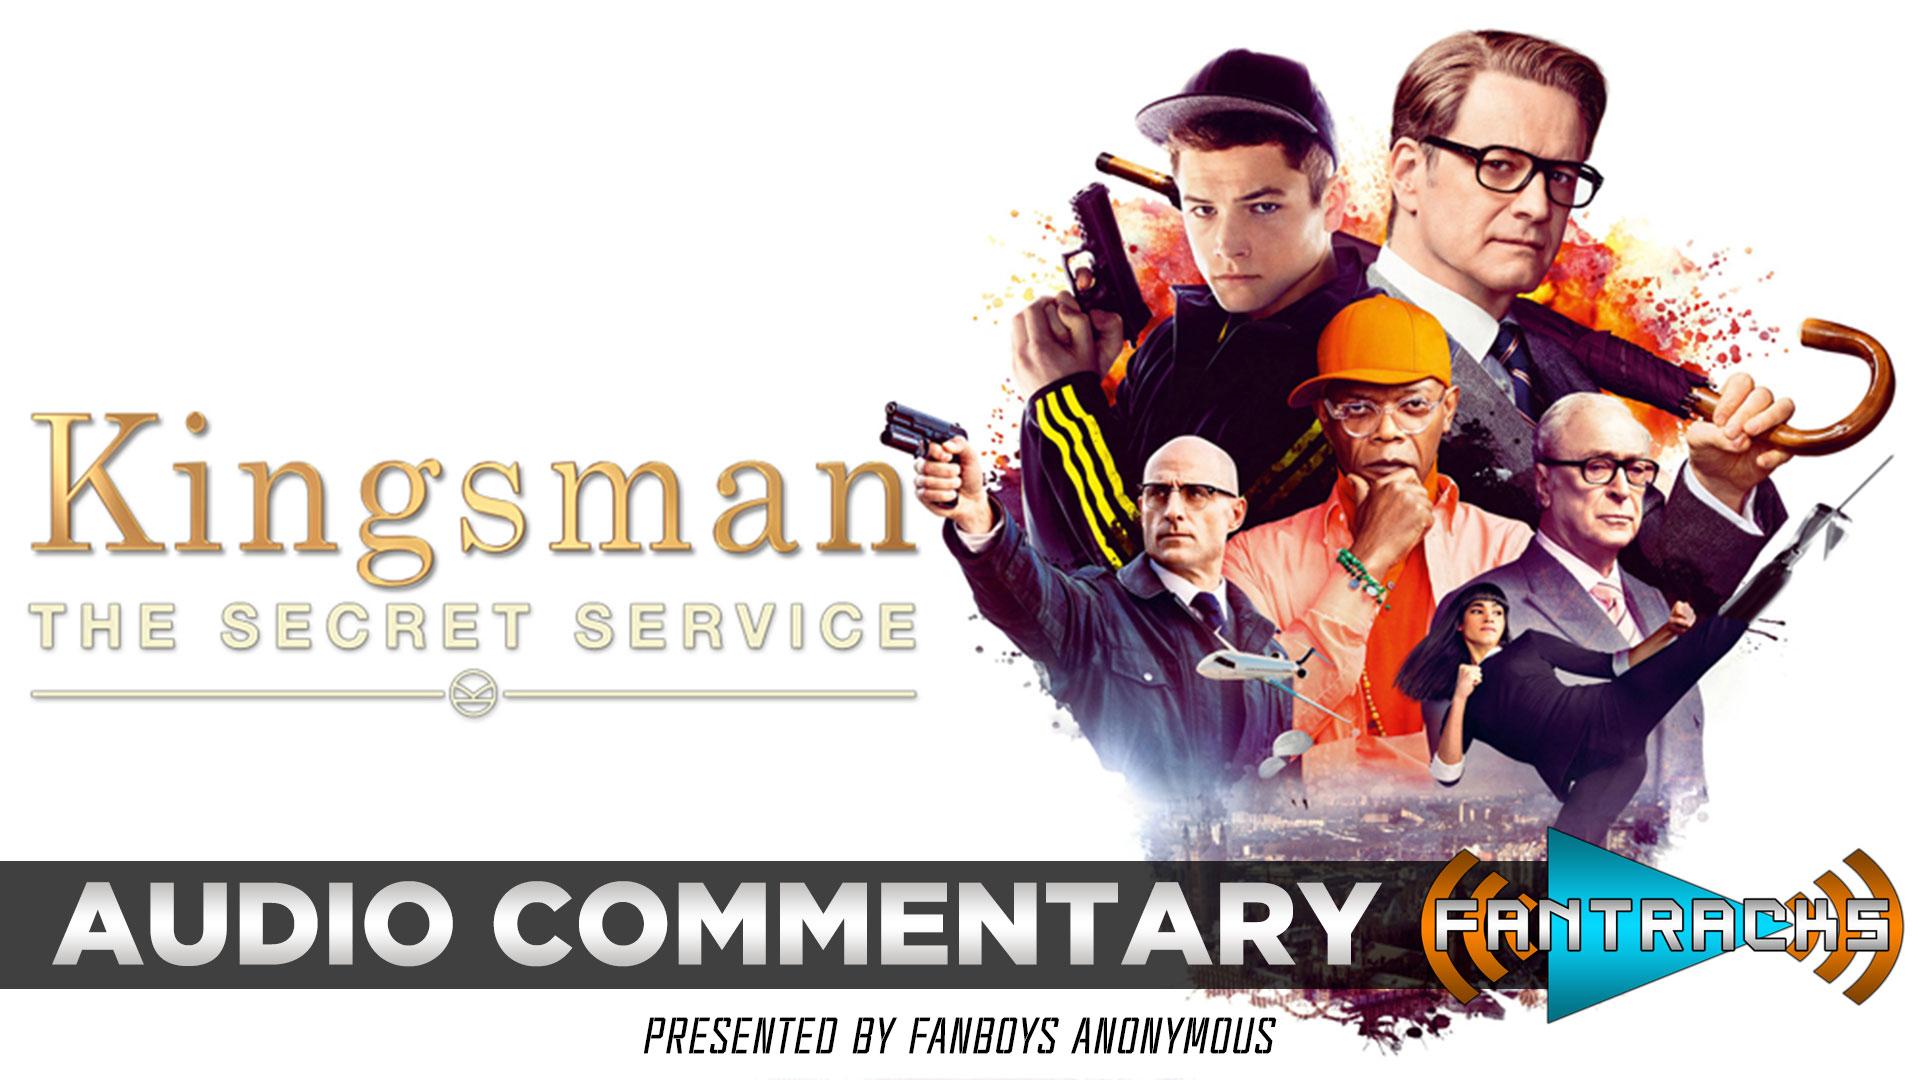 FanTracks Kingsman: The Secret Service audio commentary